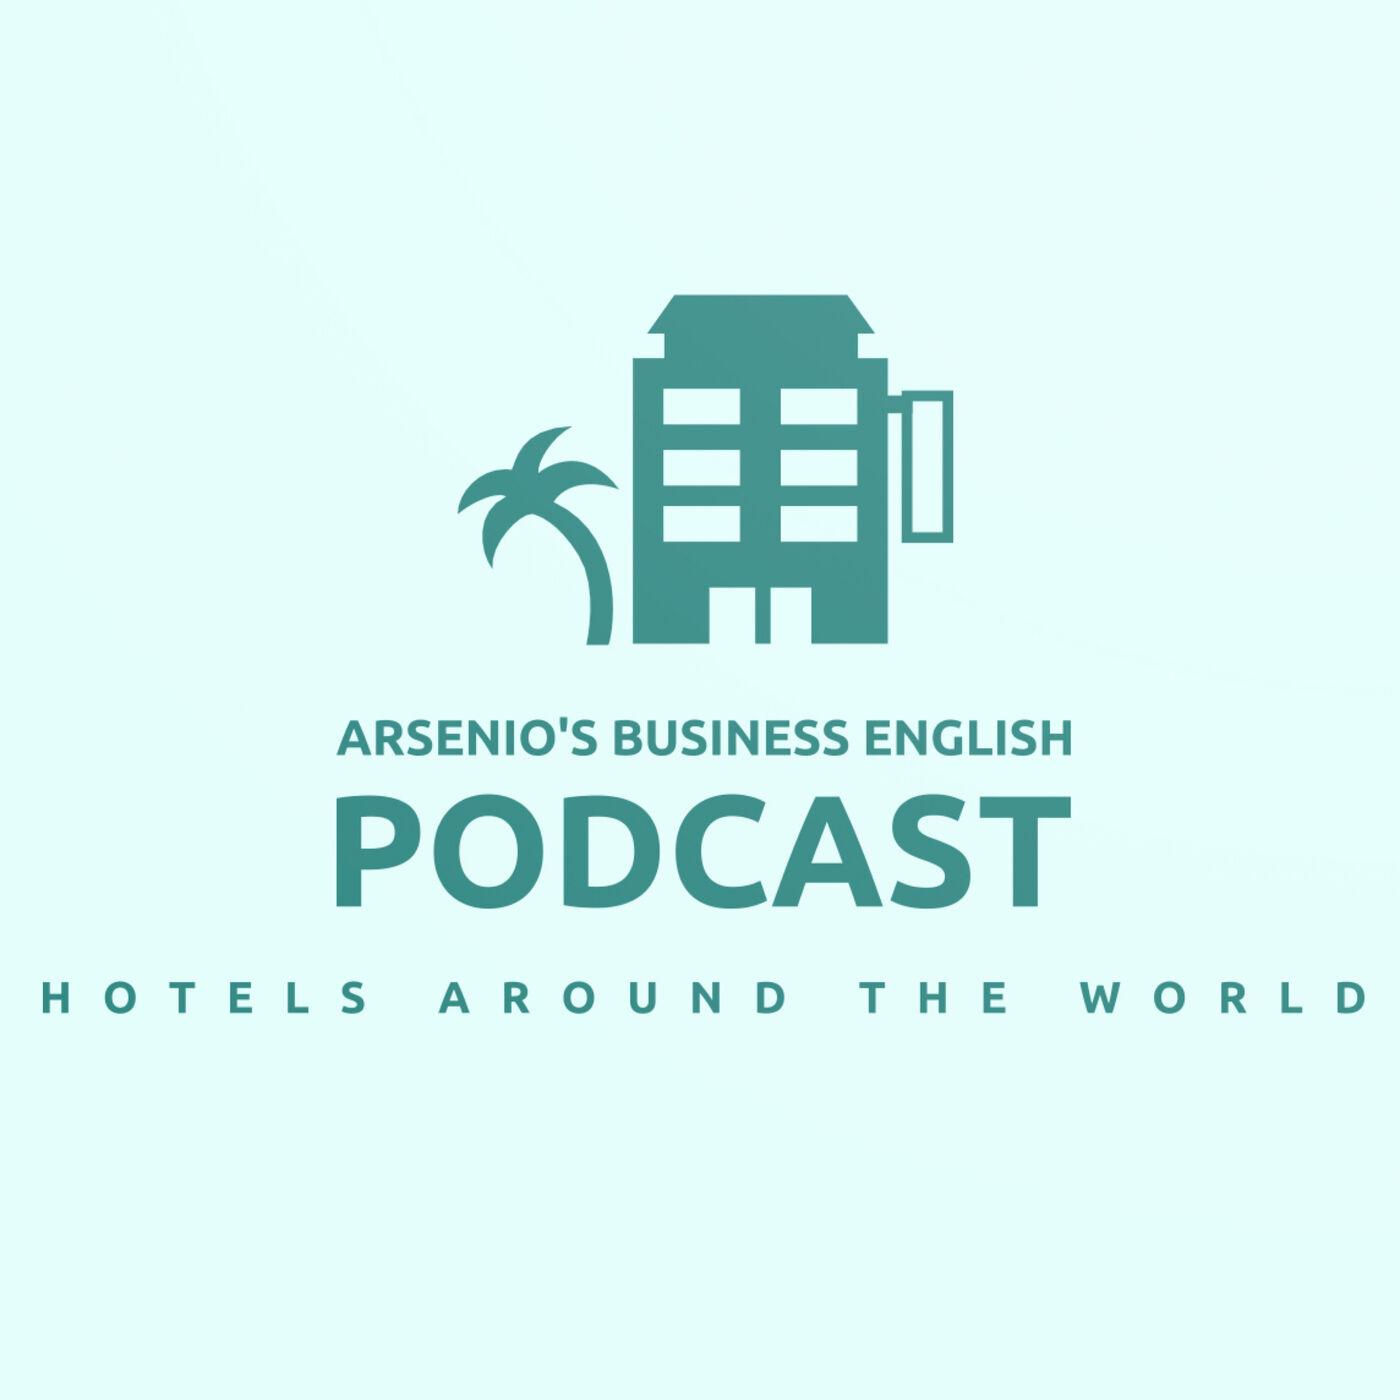 Arsenio's Business English Podcast | Season 6: Episode 17 | Hotels